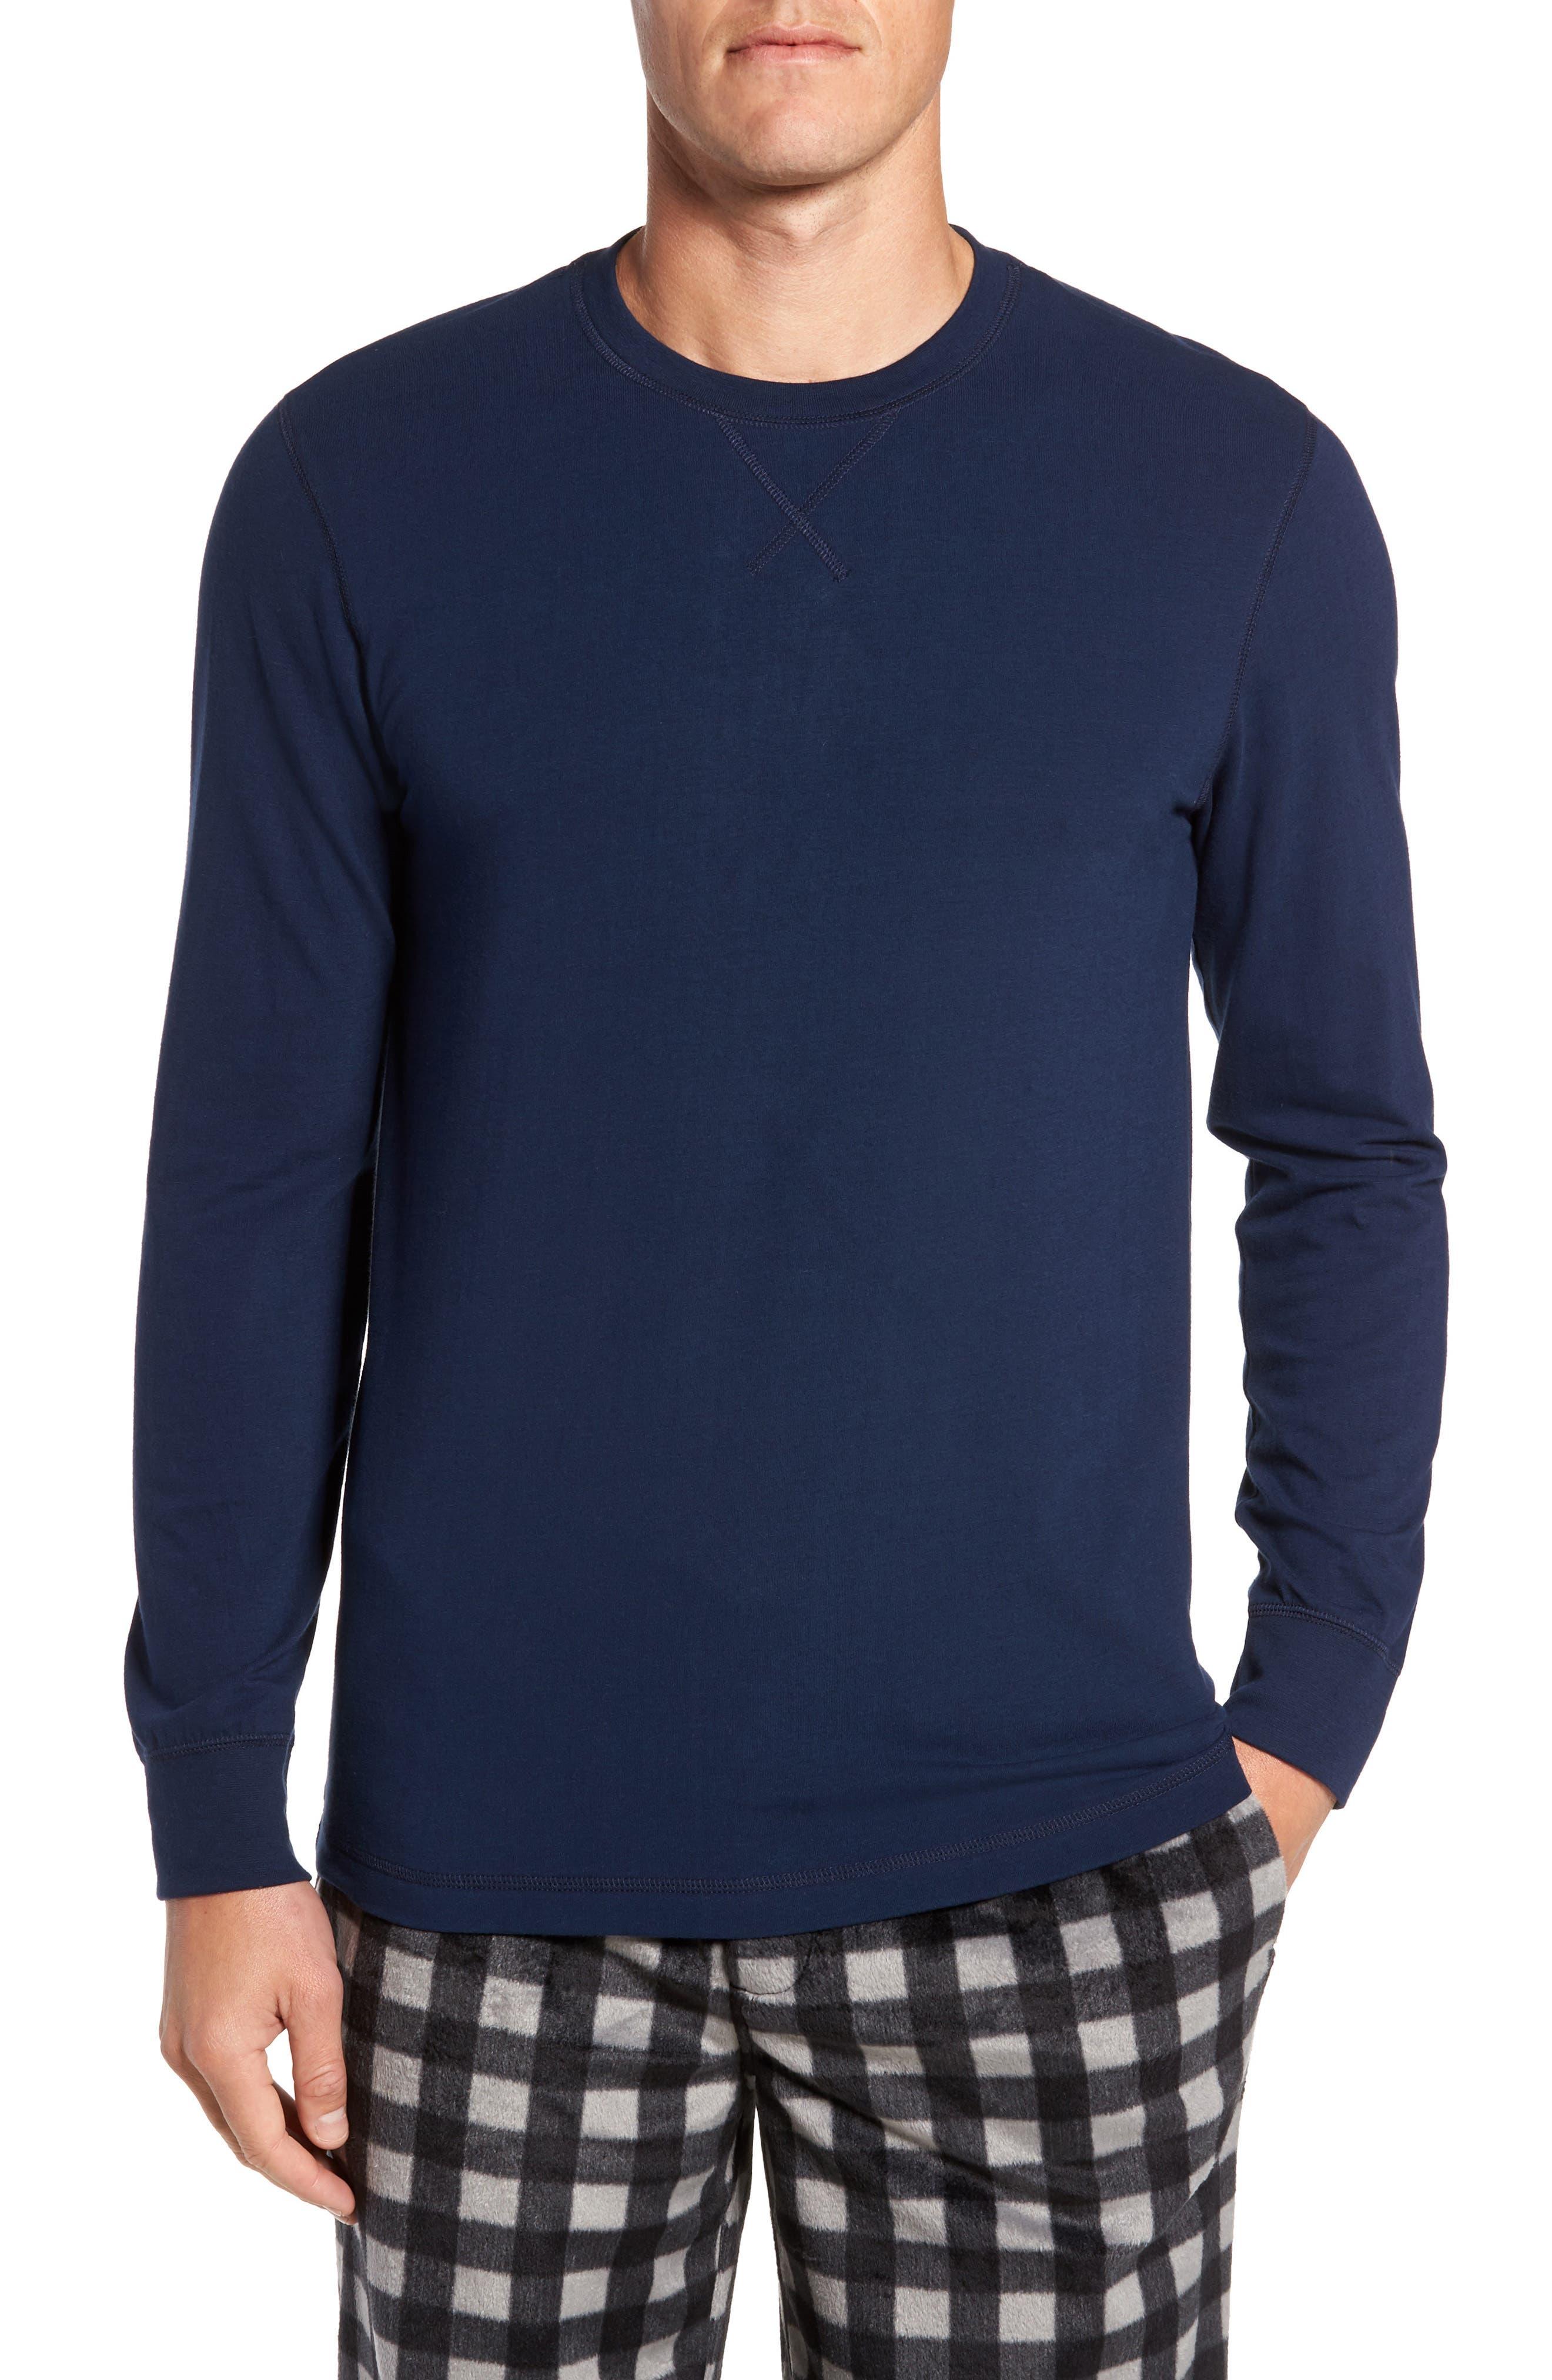 Nordstrom Men's Shop Stretch Cotton Long Sleeve T-Shirt